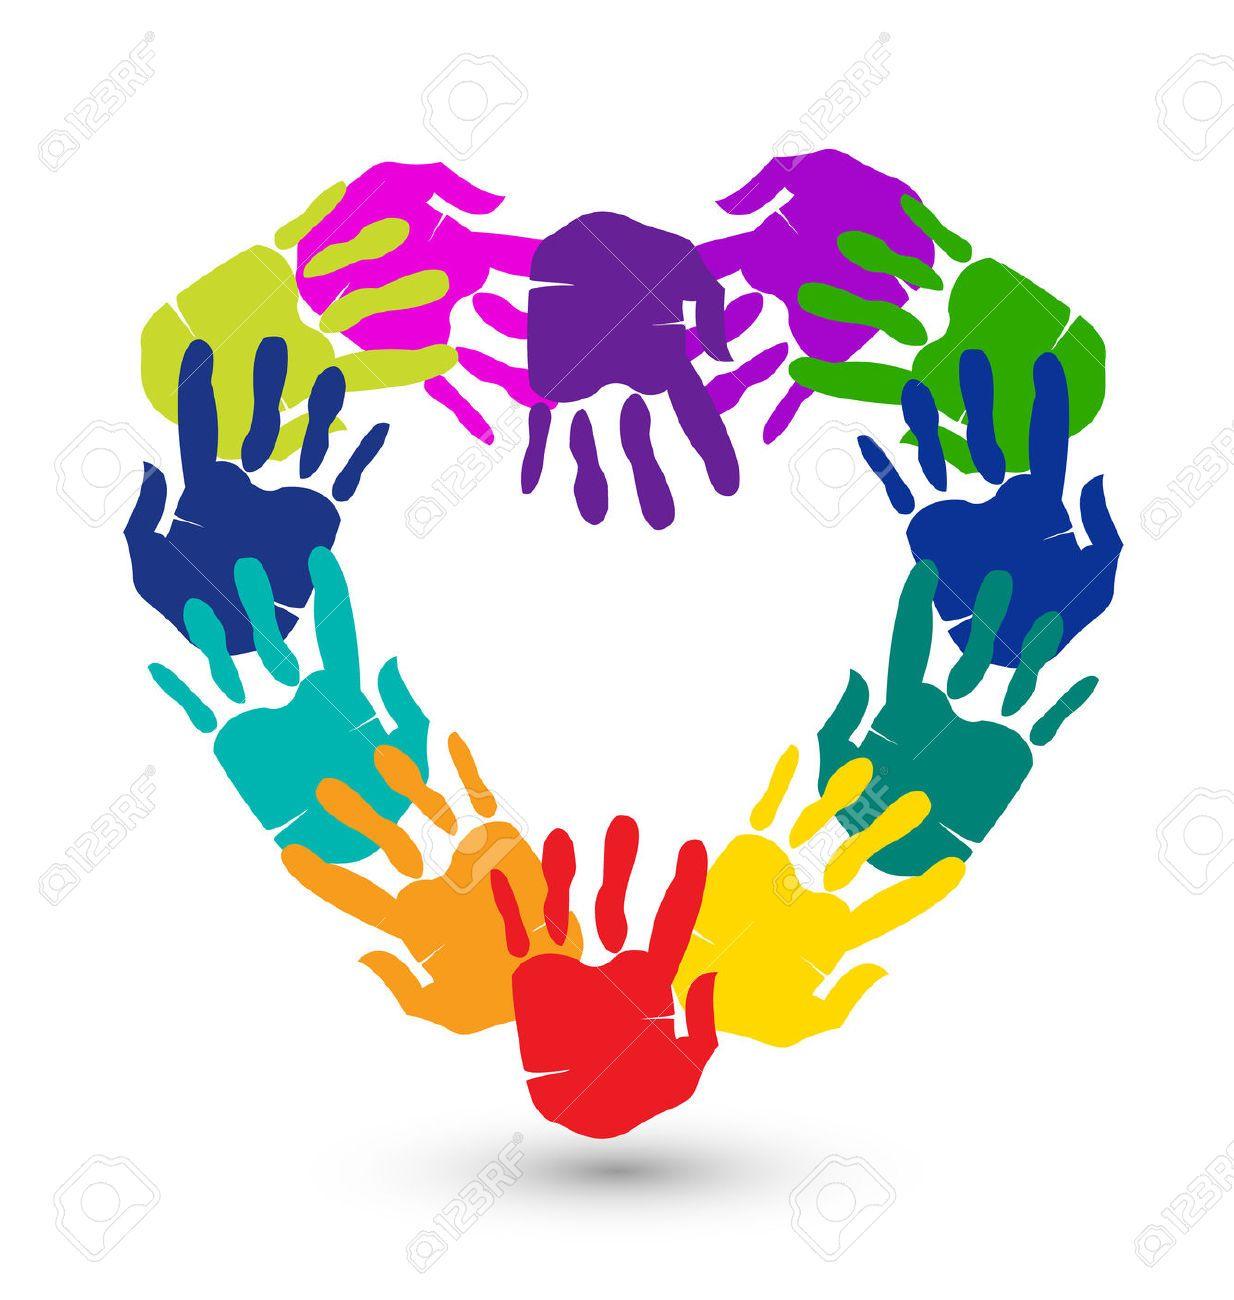 Stock Vector Hand logo, Hand art, Helping hands logo